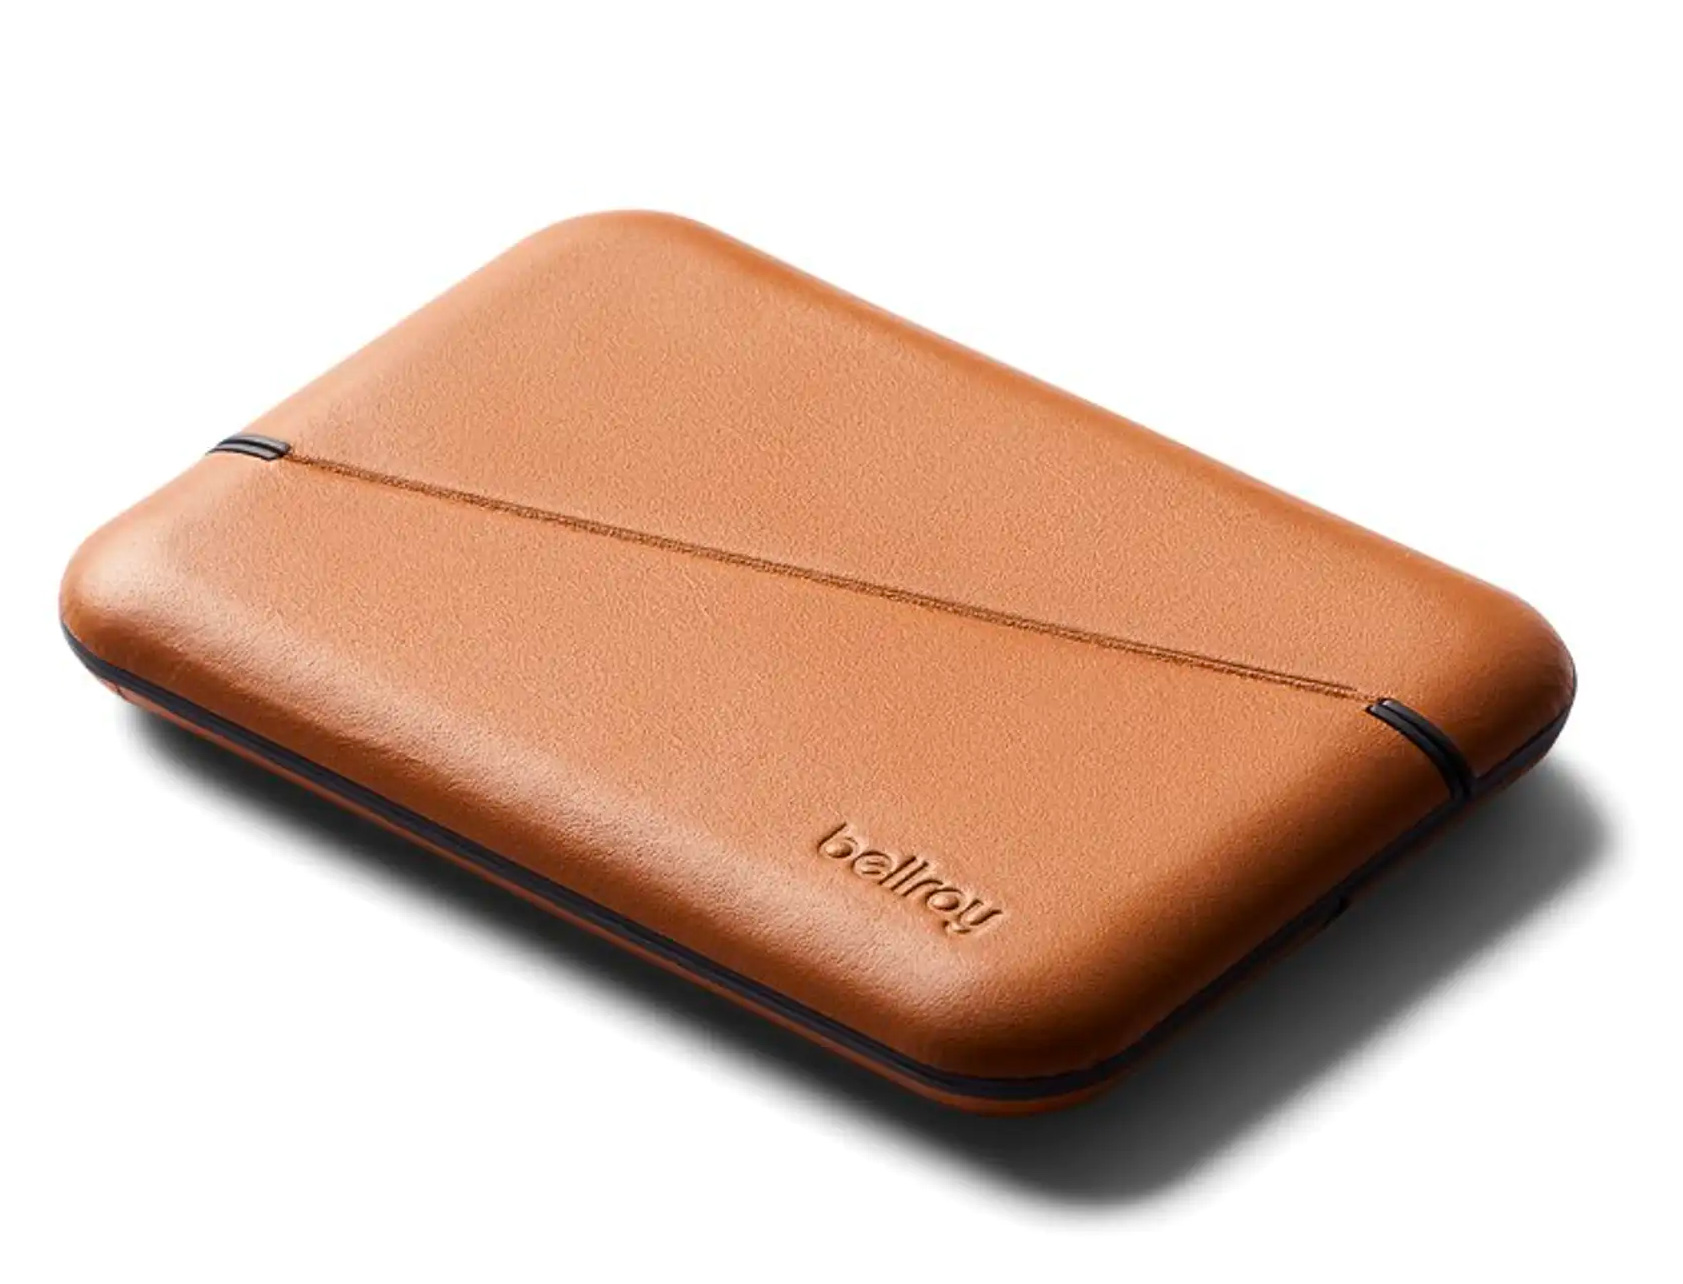 Magnets Make This Flip Case Wallet Irresistible at werd.com